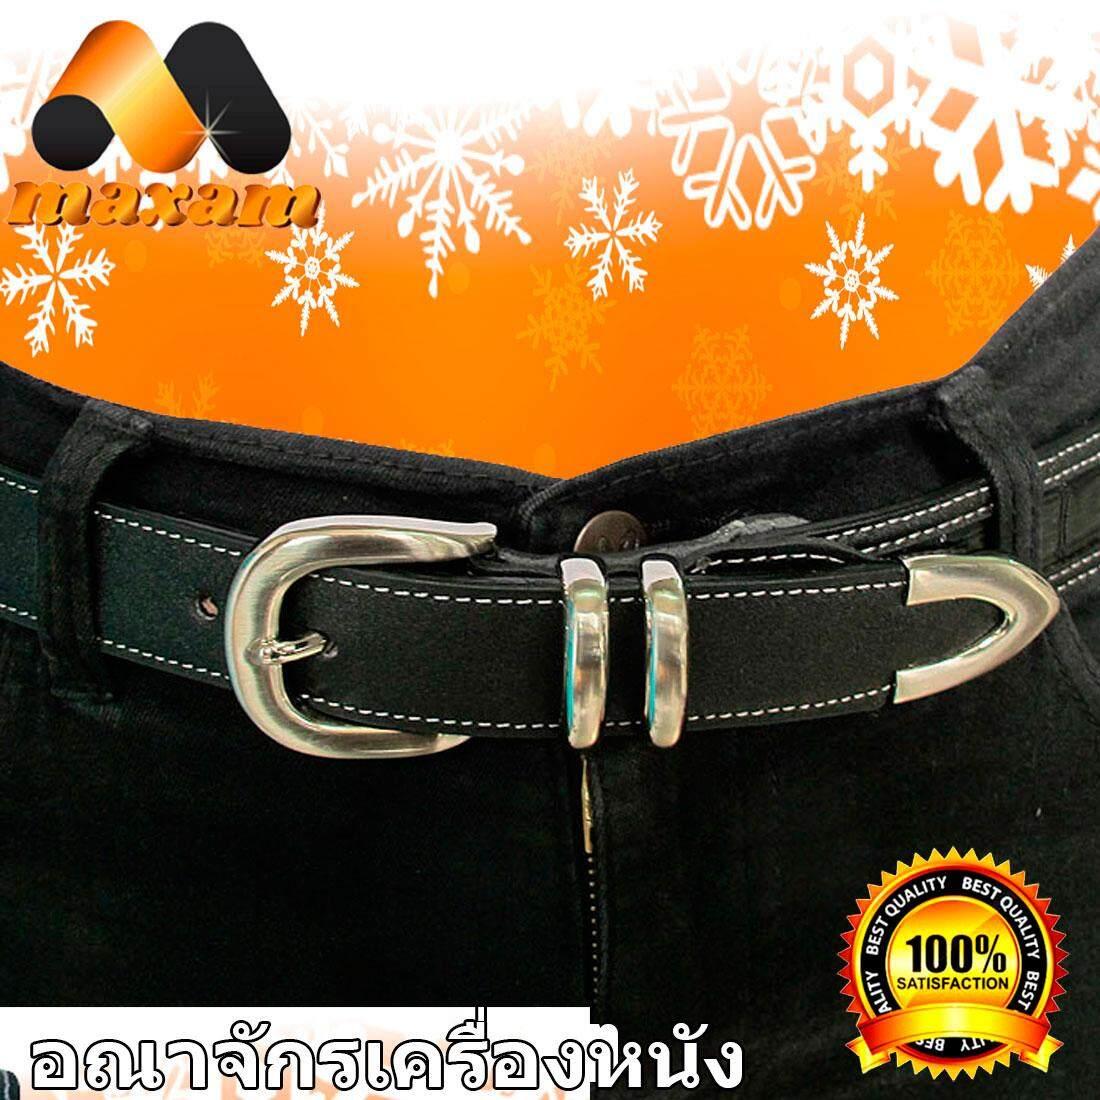 maxam design     สุดเทห์ Super Black สีดำ เข็มขัดหนังแท้ หนังวัว เรียกว่า รุ่น ไทเกอร์ Tiger โดดเด่นที หัวเข็มขัด สายร้อยเข็มขัด และ ปลายสายเข็มขัด หุ้มด้วยนิกเกล      maxam design